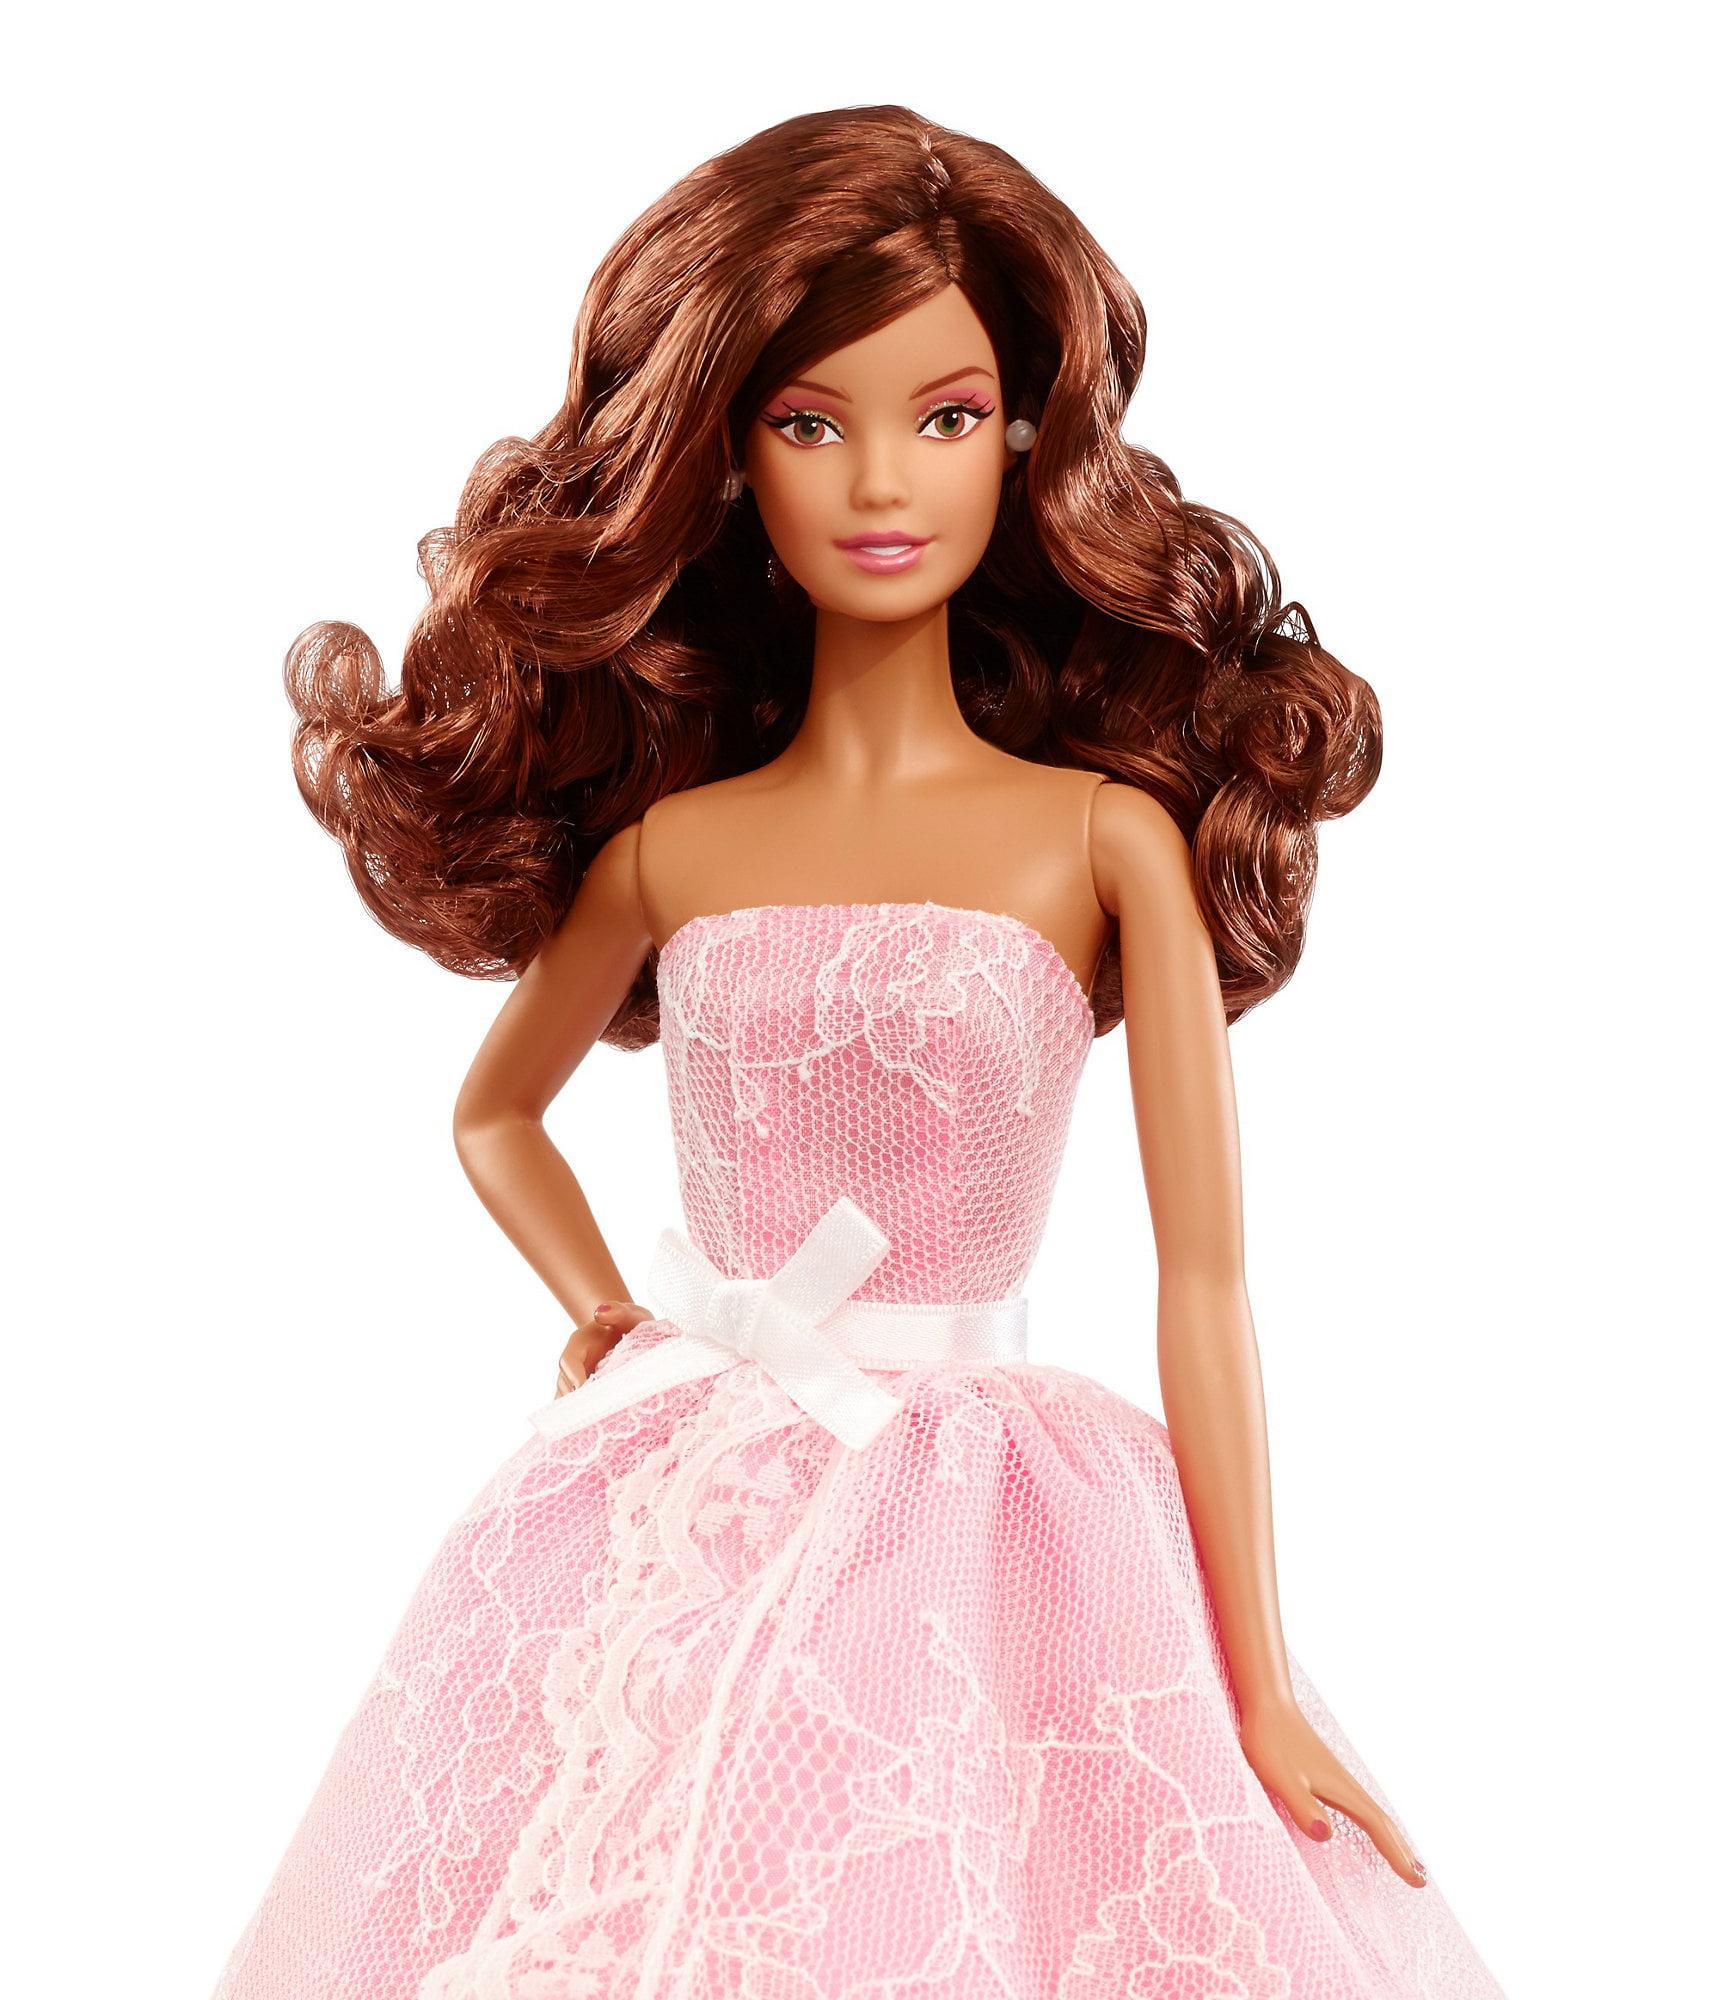 Barbie 2015 Birthday Wishes Latina Doll by Mattel